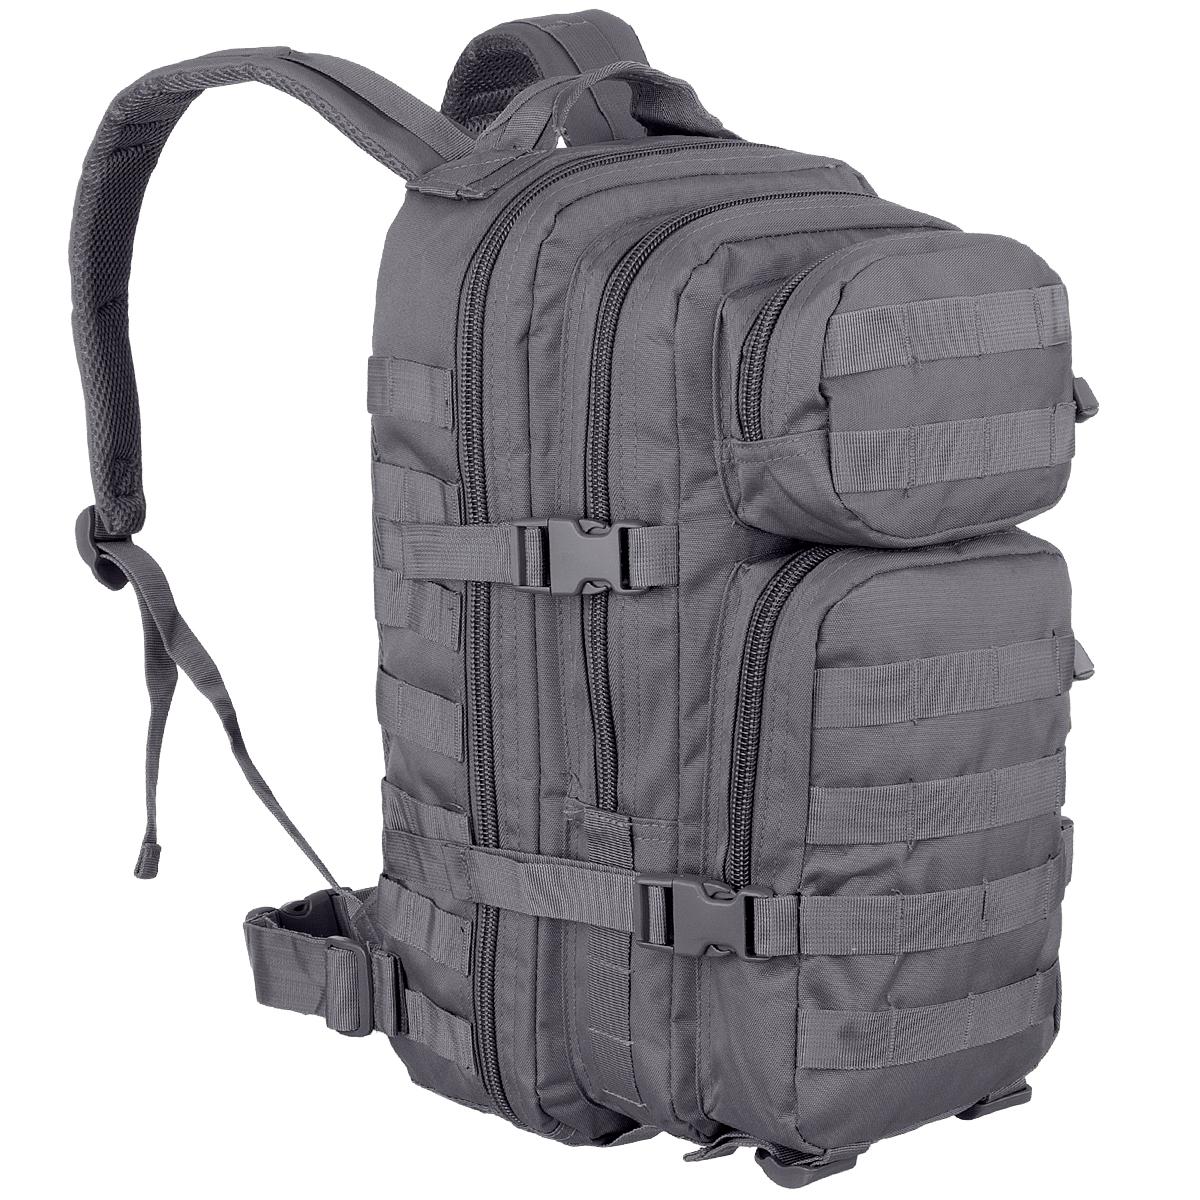 4438d4b2878c1 Plecak Mil-Tec US Assault Mały Urban Grey Plecak Mil-Tec US Assault Mały  Urban Grey